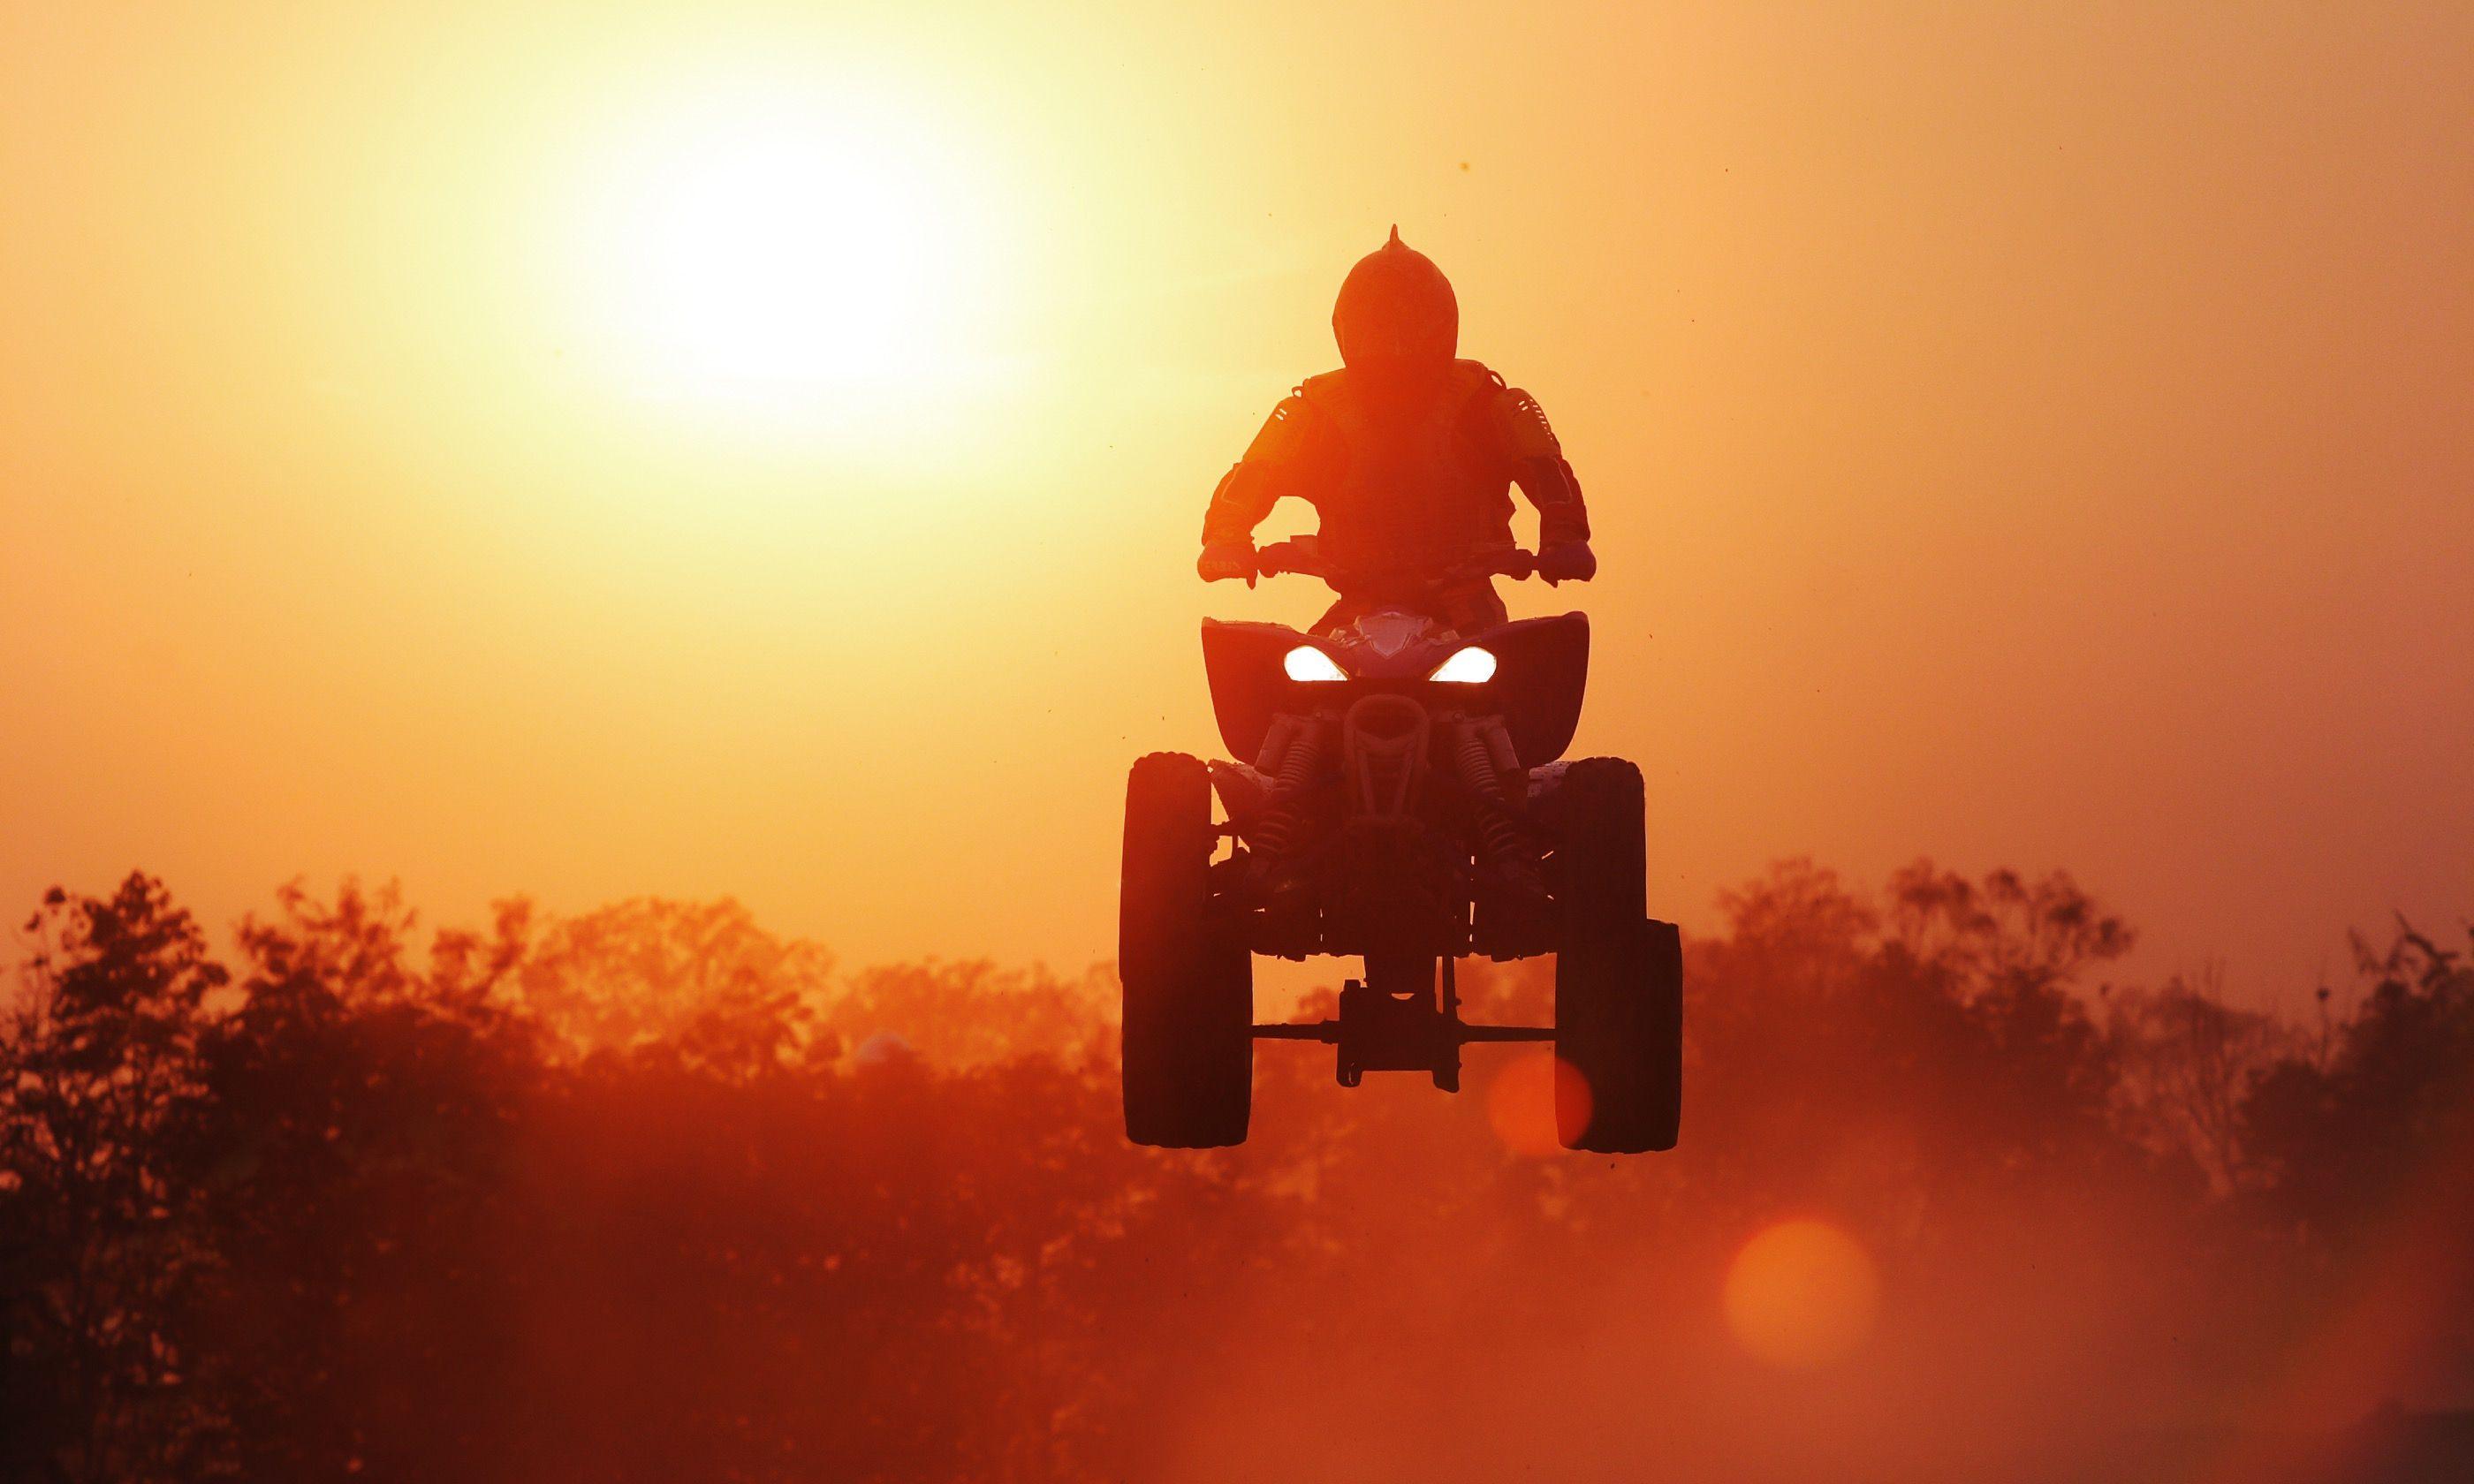 Quad bike silhouette (Shutterstock.com)